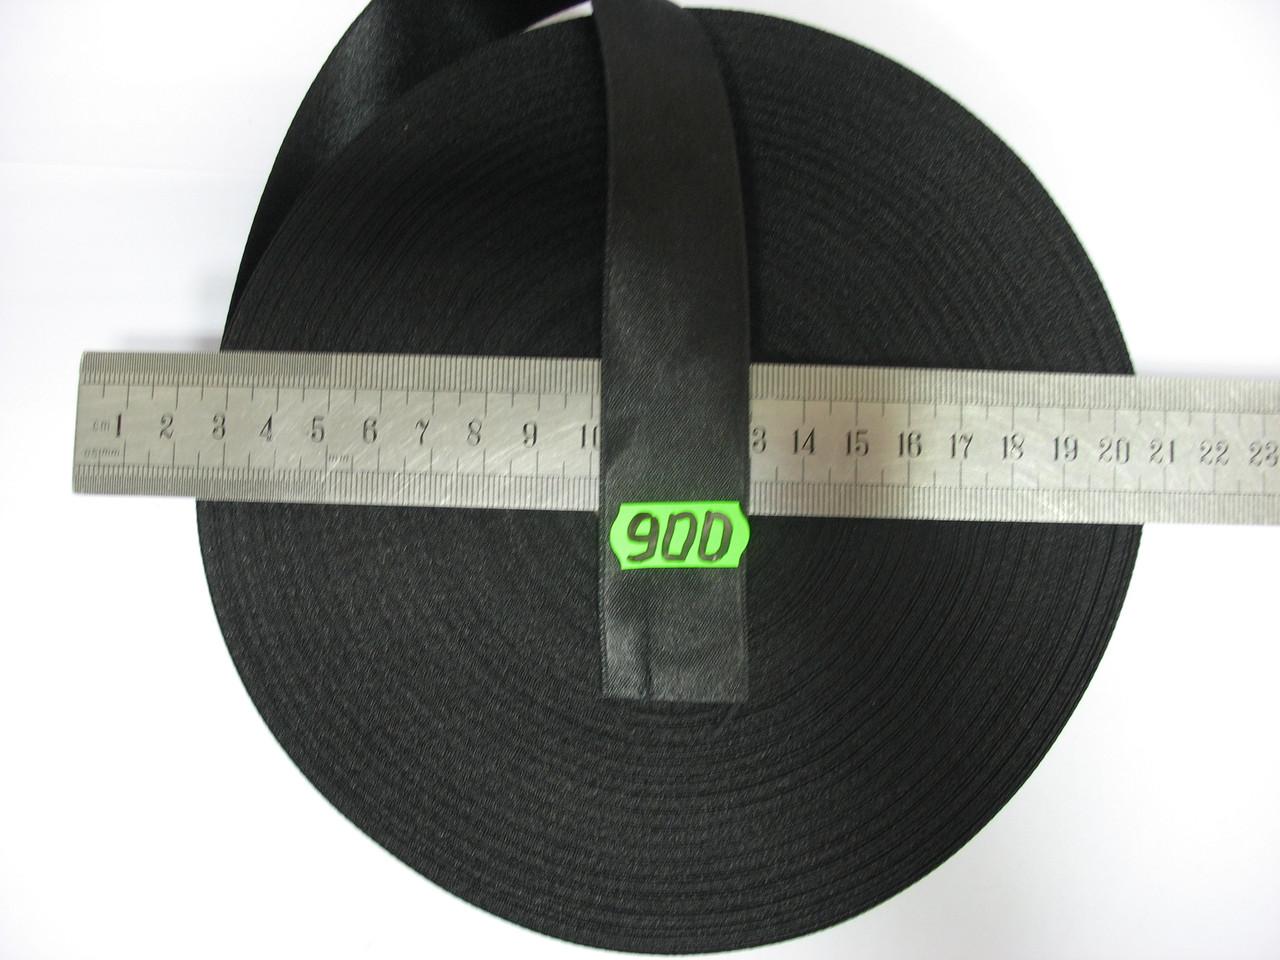 Лента атласная двухсторонняя 30мм, цвет черный, Турция